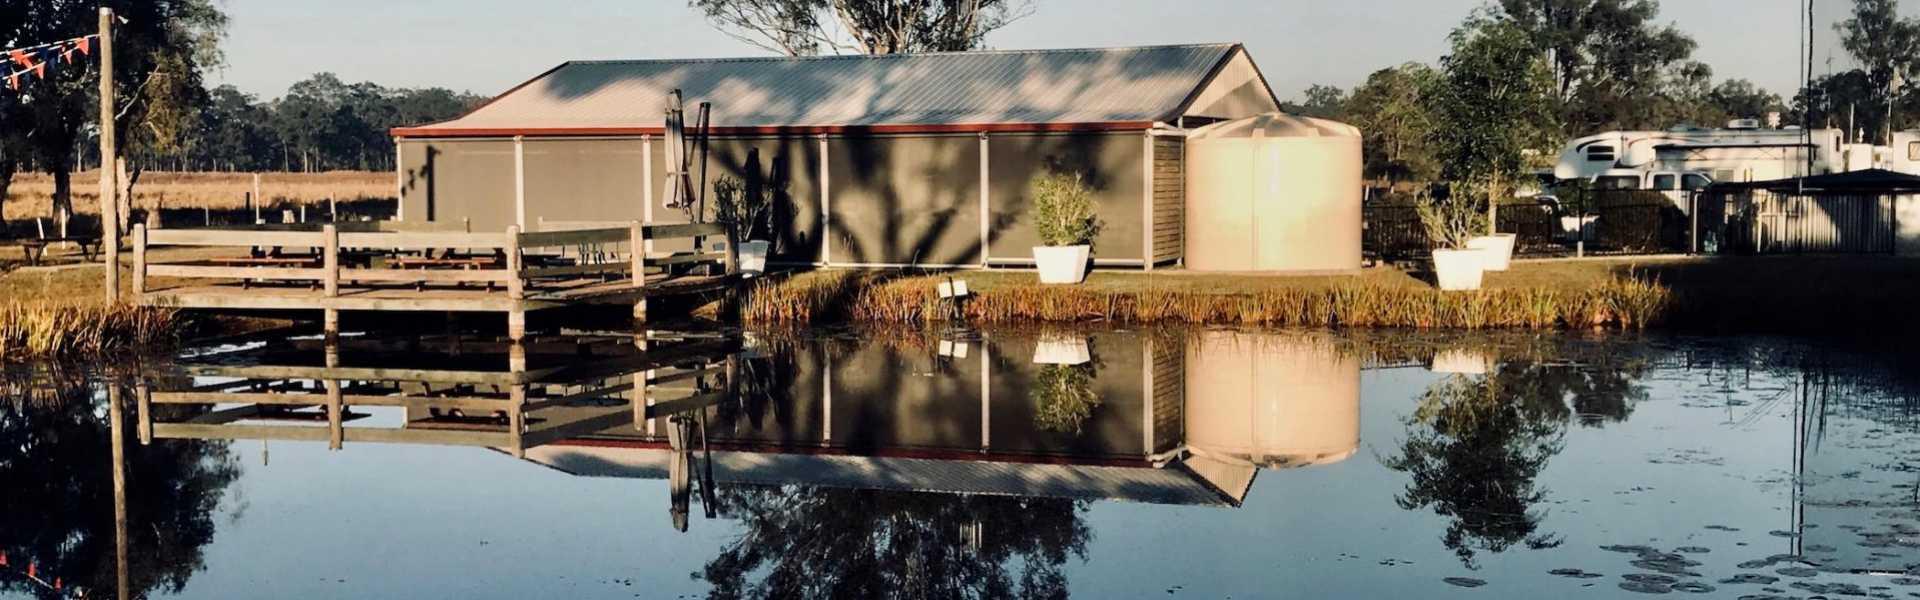 Kui Parks, Cheery Nomad RV Park & Farmstay, Maryborough, Decking